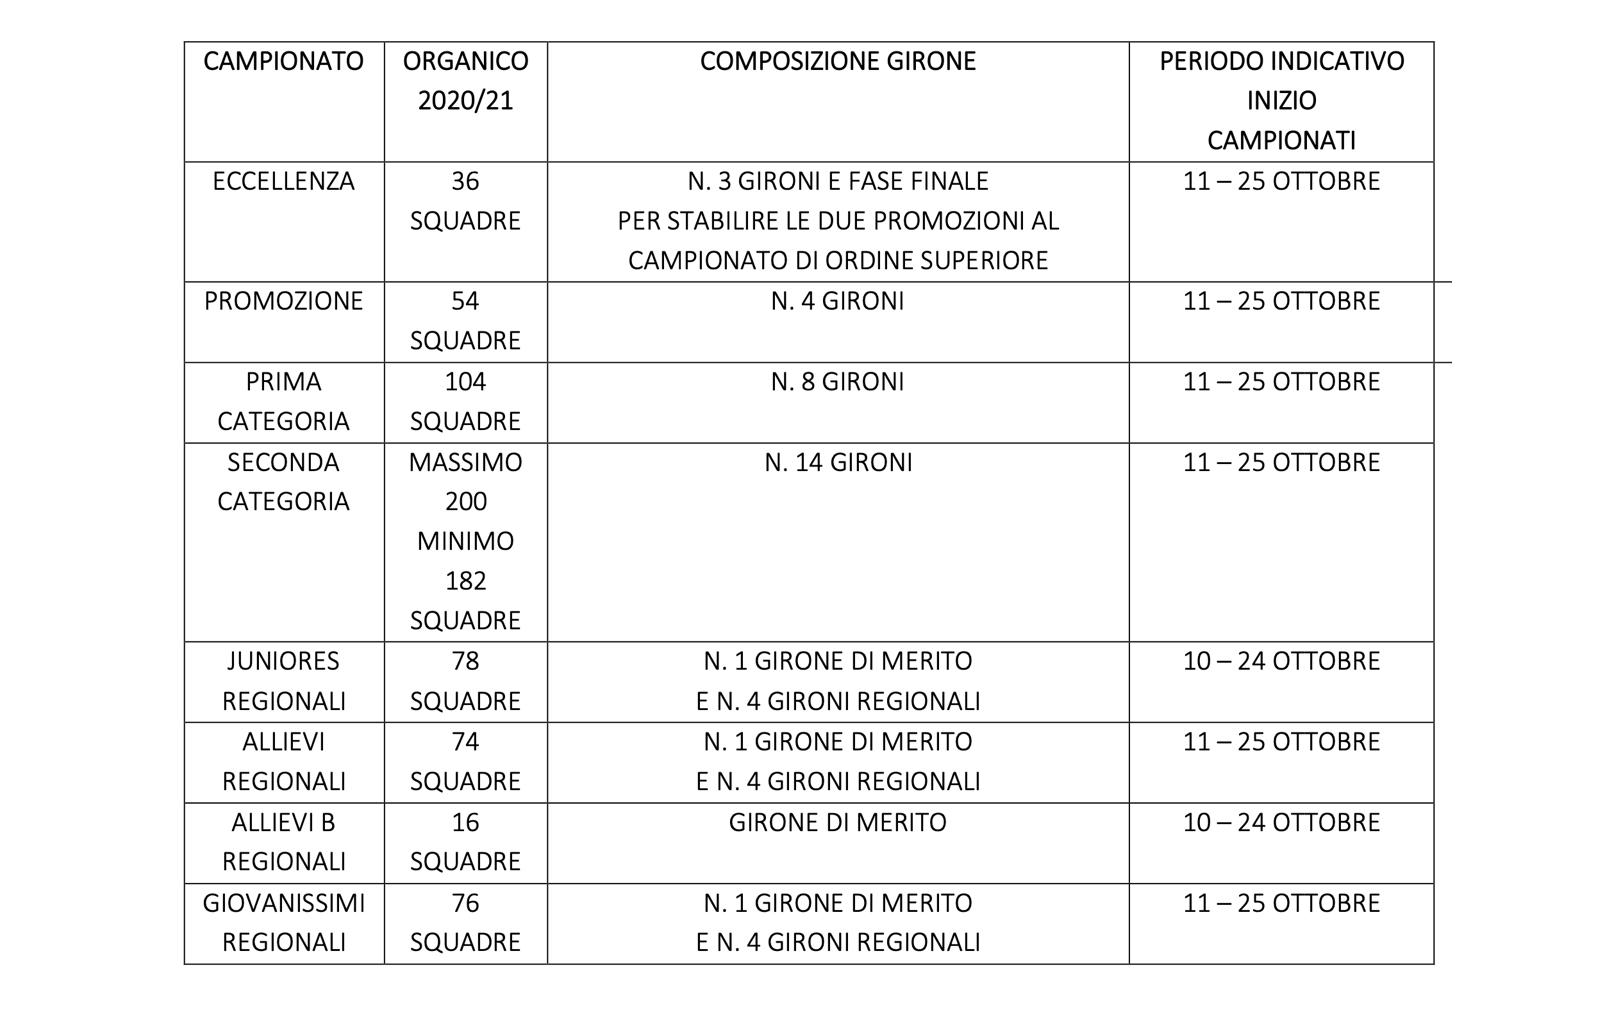 Dilettanti_format_campionati_2020_2021-2